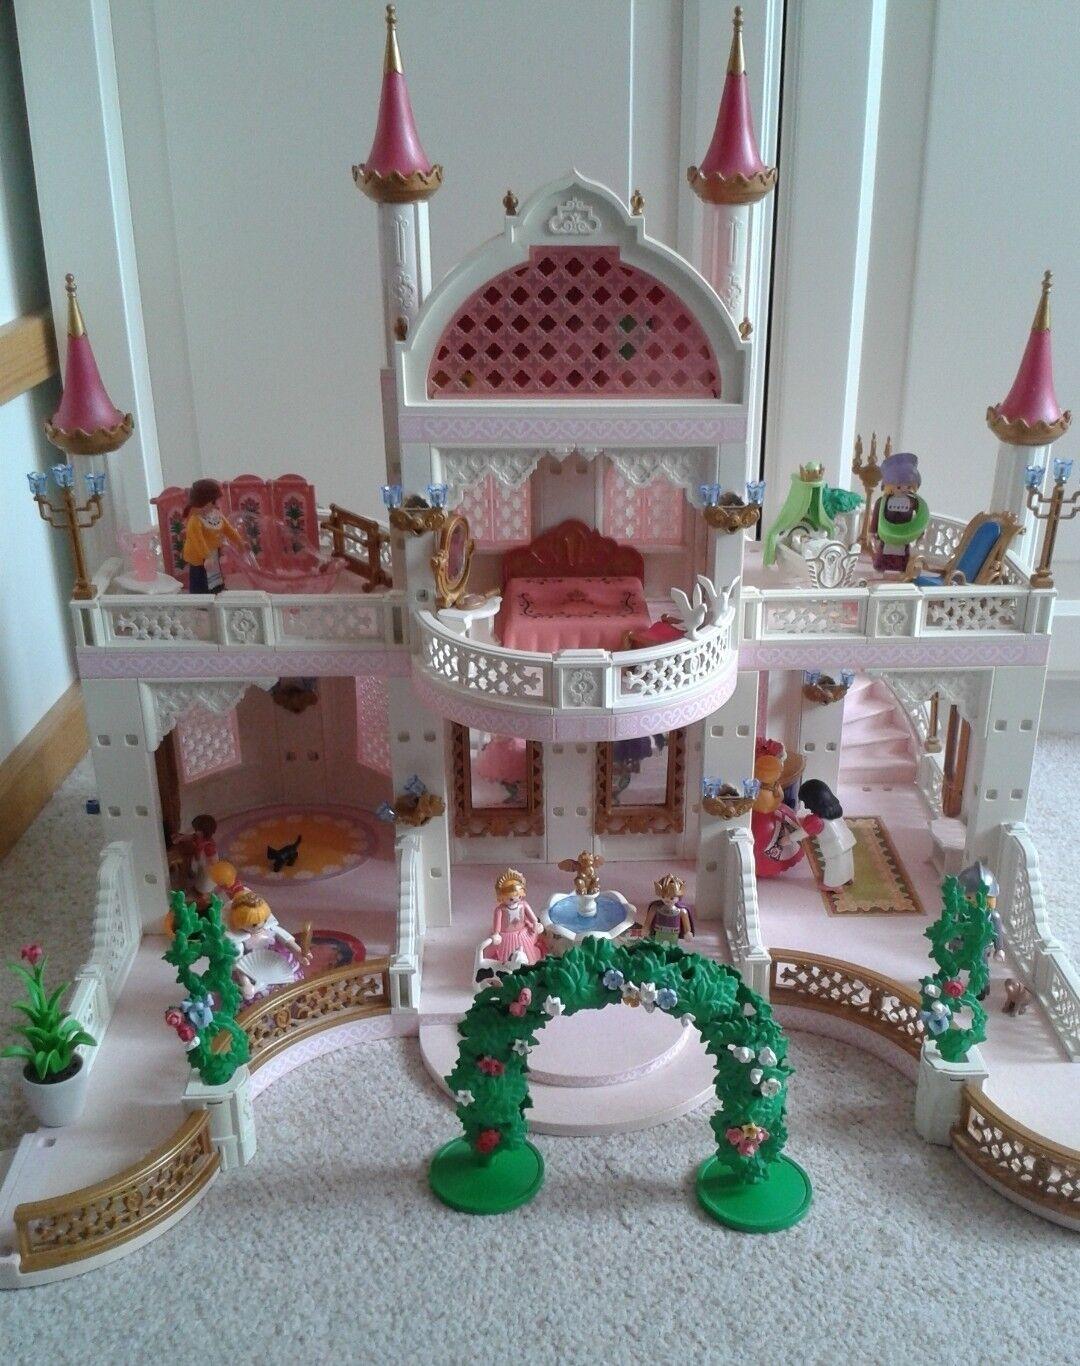 Playmobil 4250 Märchenschloss mit 4254 Babyzi 4253 Schlafzi 4256 Königsthron